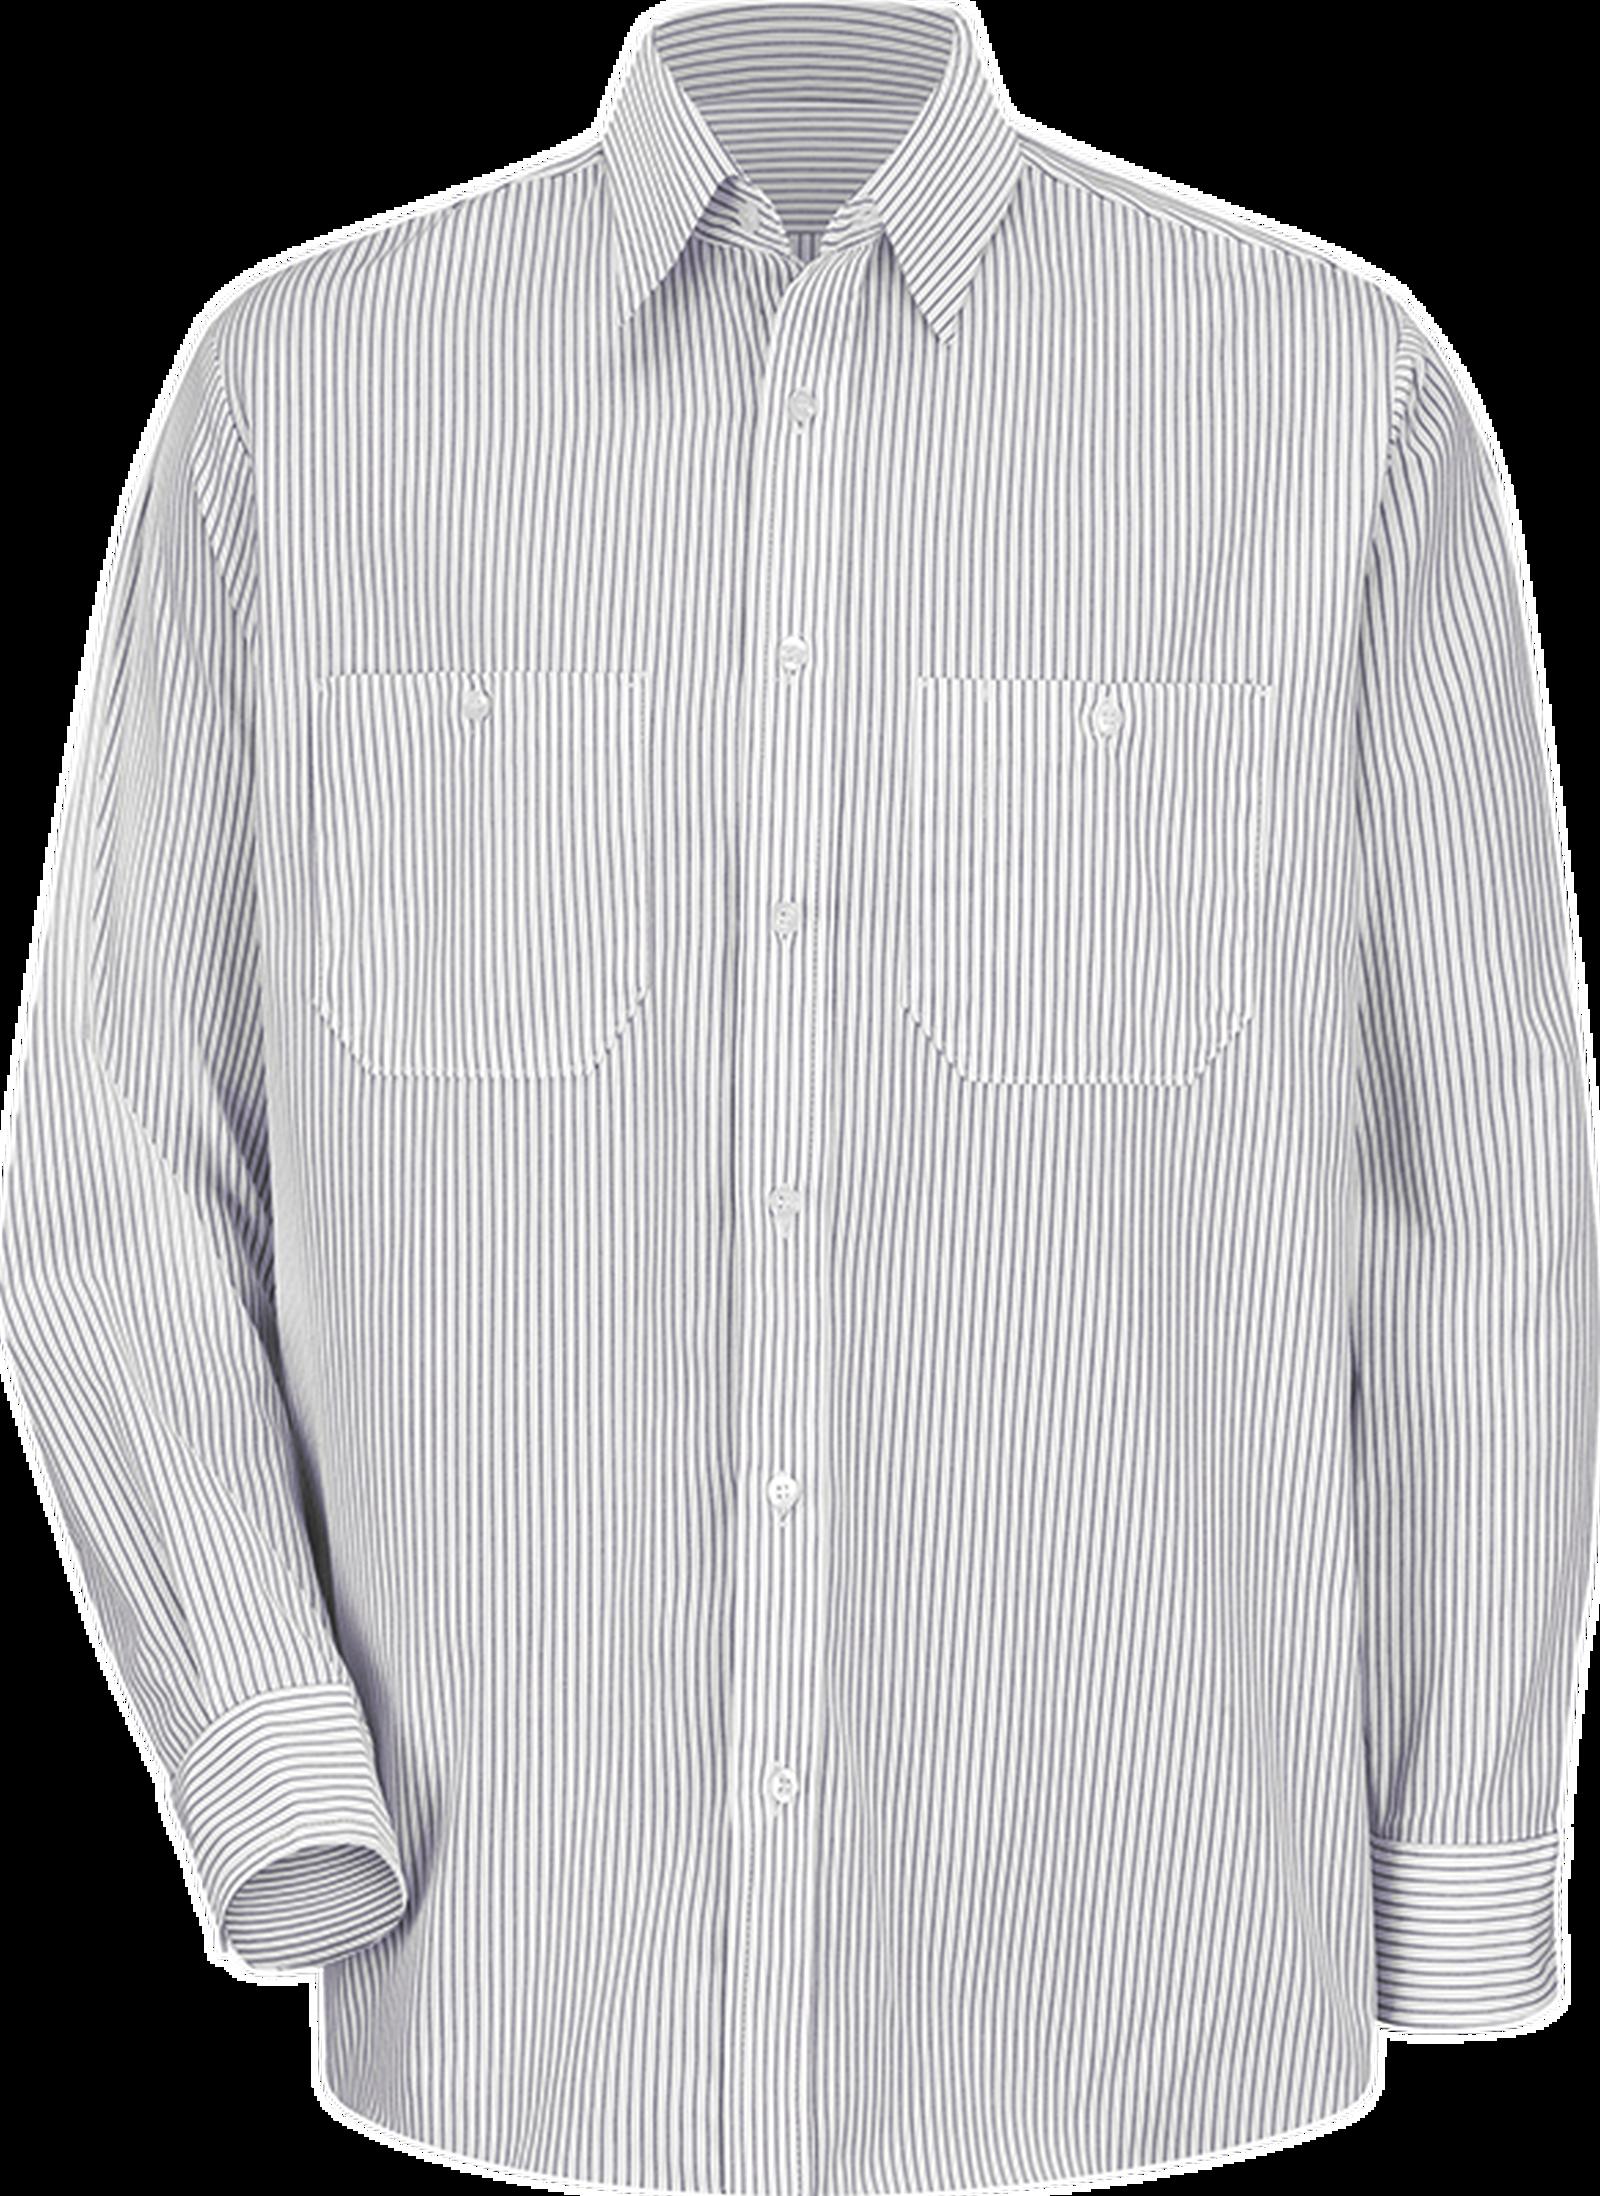 00aea590 Men's Long Sleeve Striped Dress Uniform Shirt| RedKap US